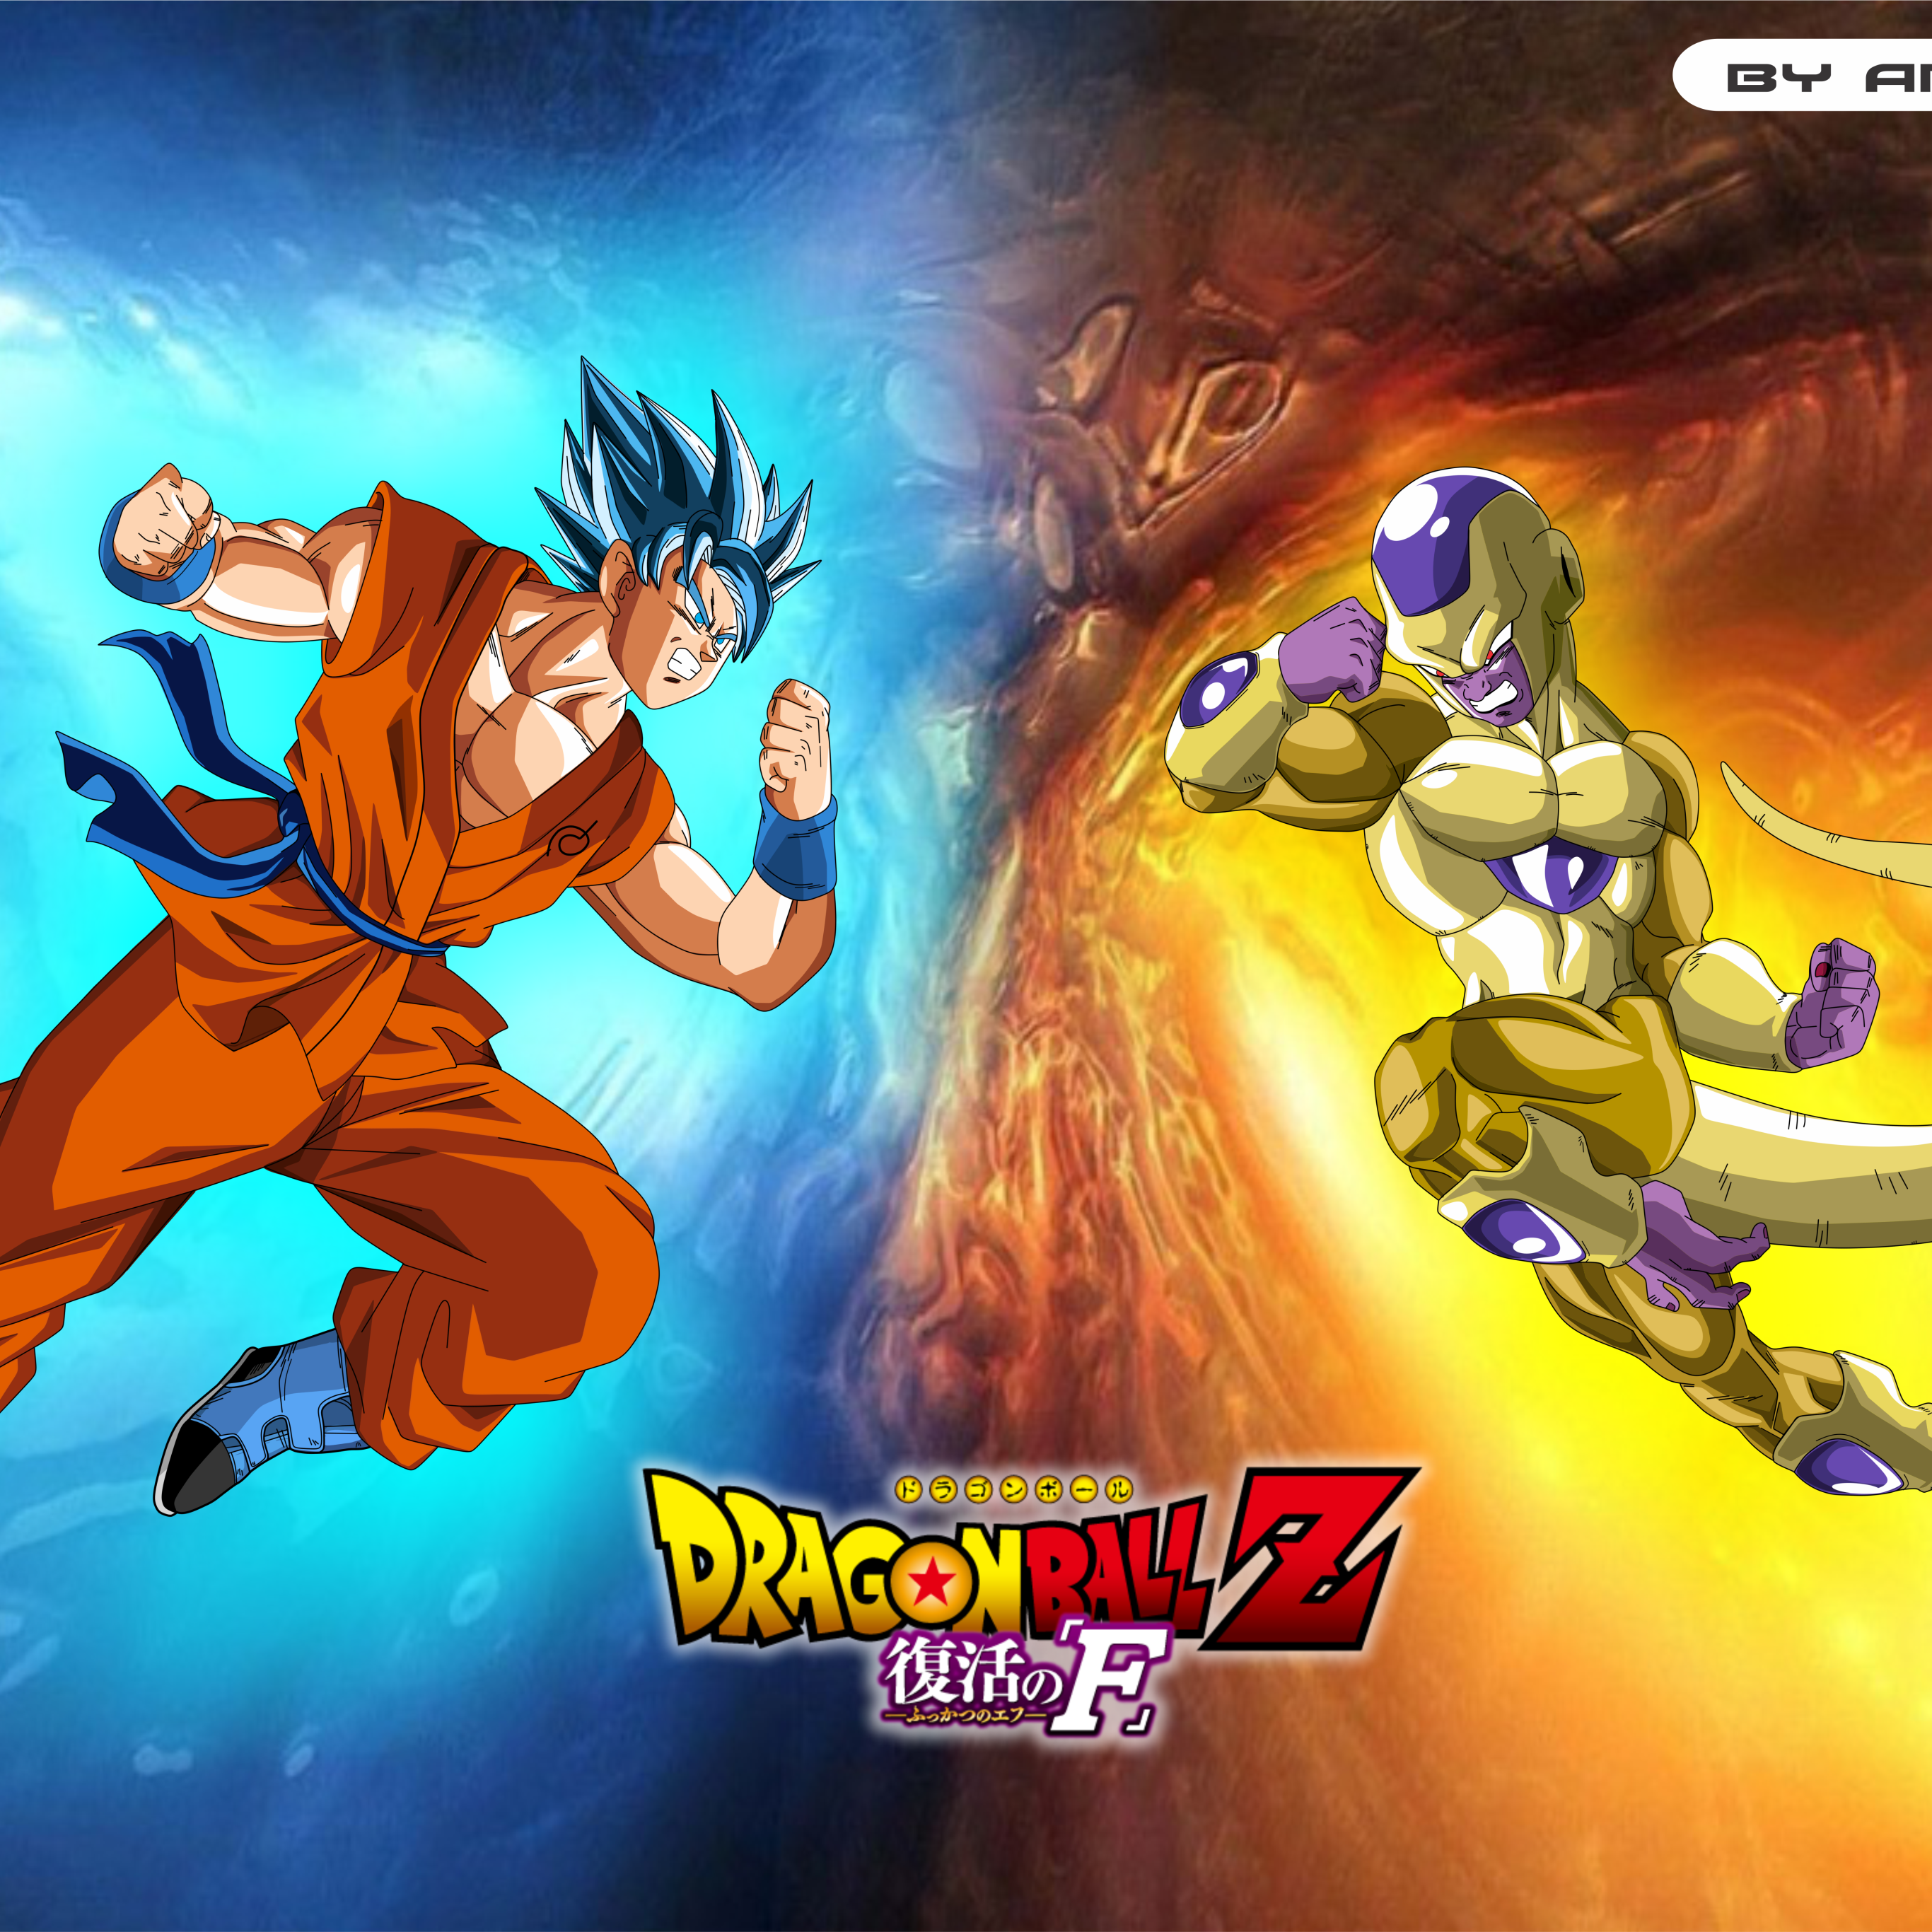 Anime Dragon Ball Z Resurrection Of F 2732x2732 Wallpaper Id